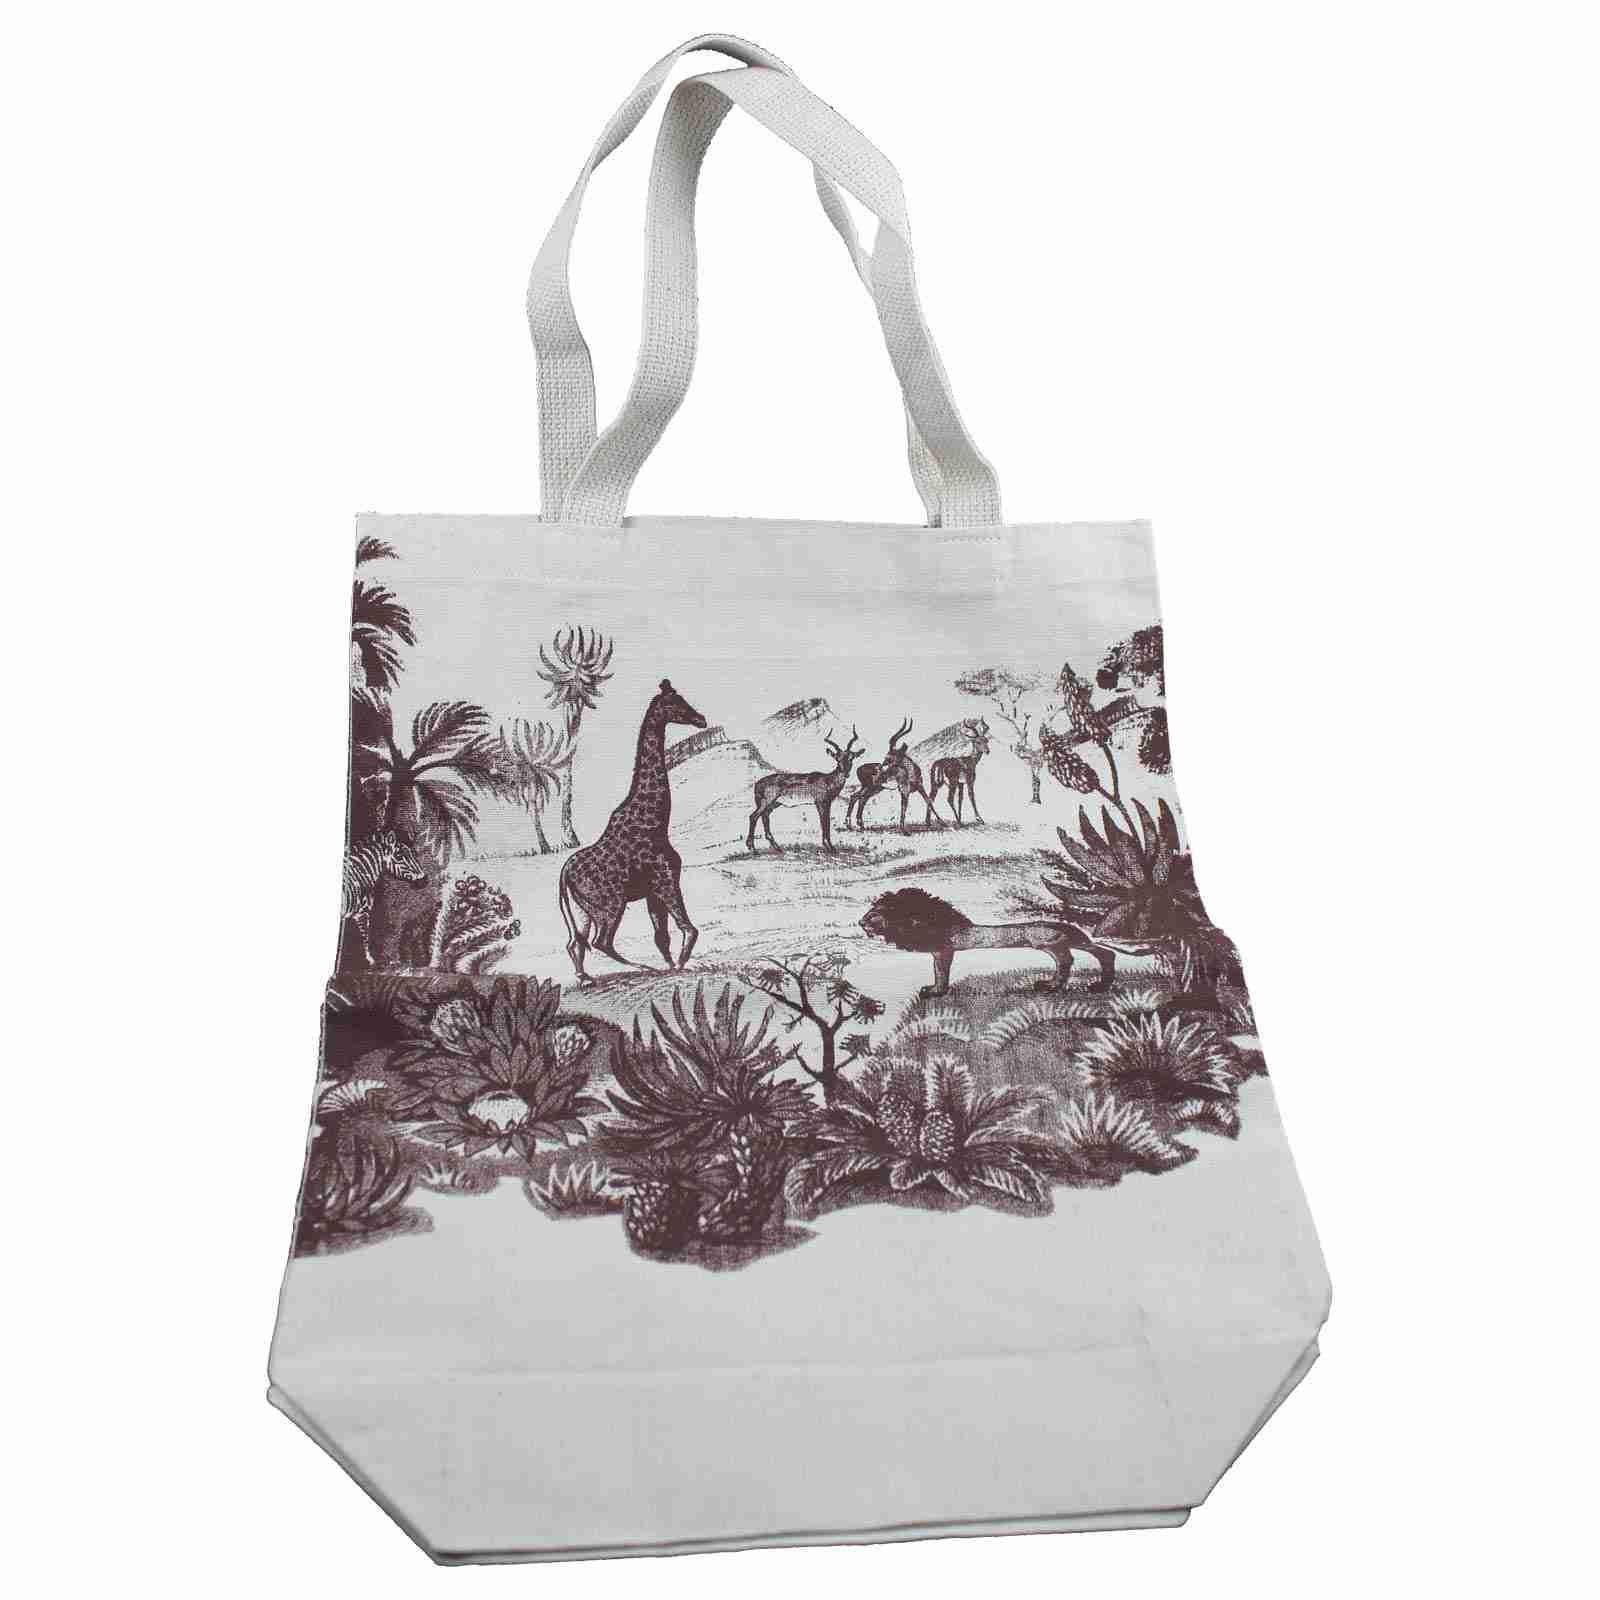 Organic Handmade Canvas Tote Bag - Safari Design | Fox and Monocle